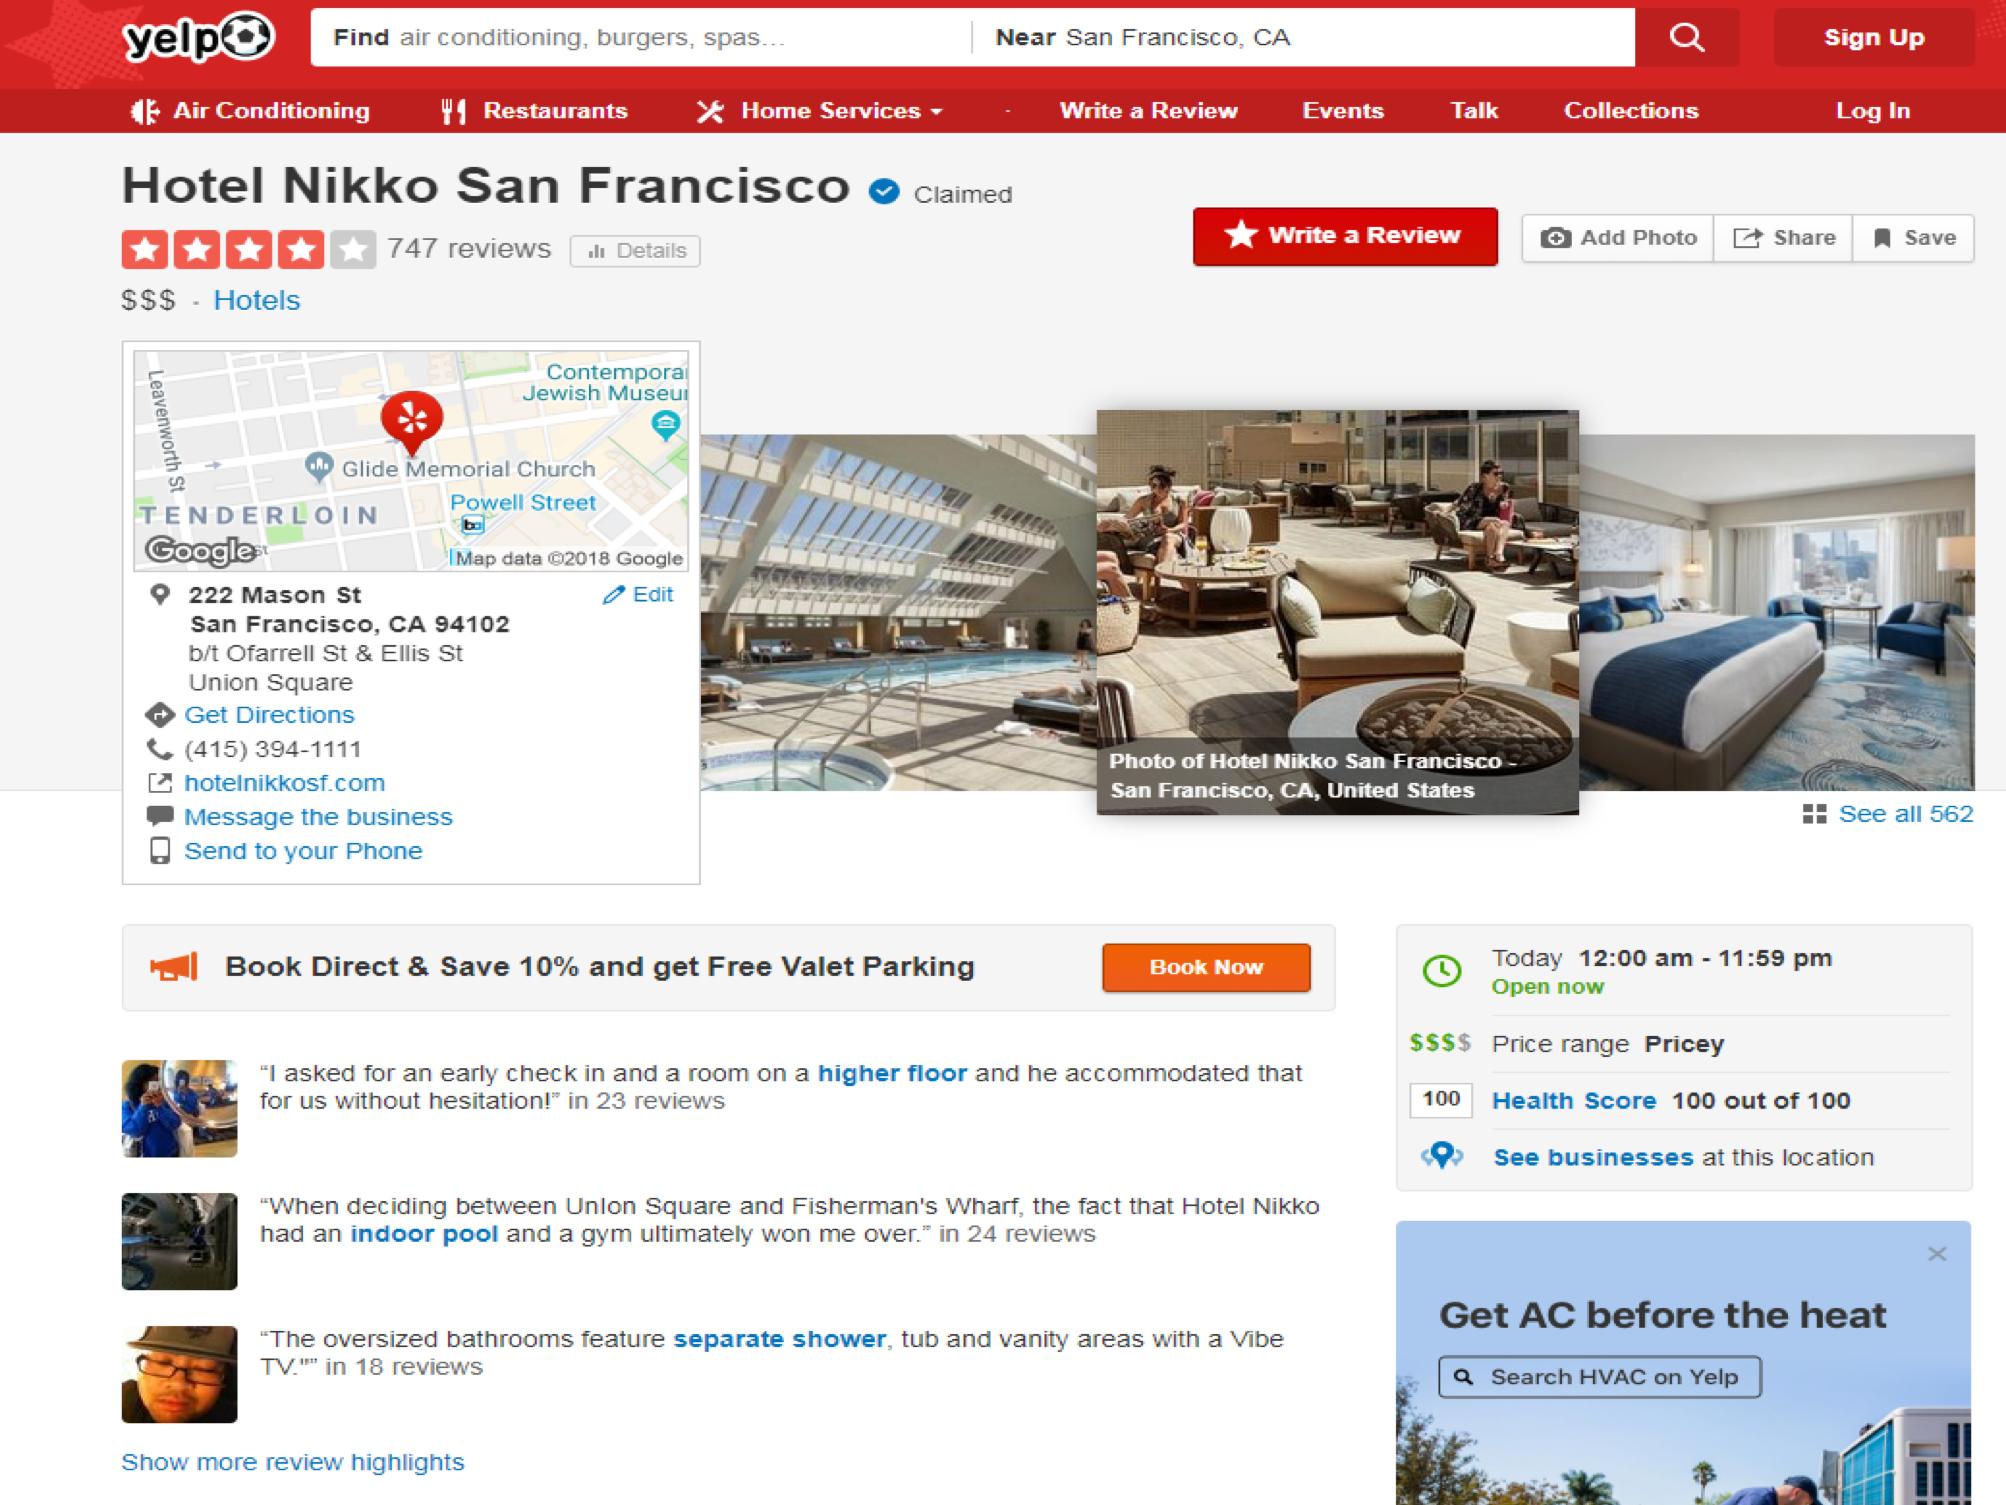 Hotel Nikko Yelp - milestoneinternet.com, Milestone Inc.